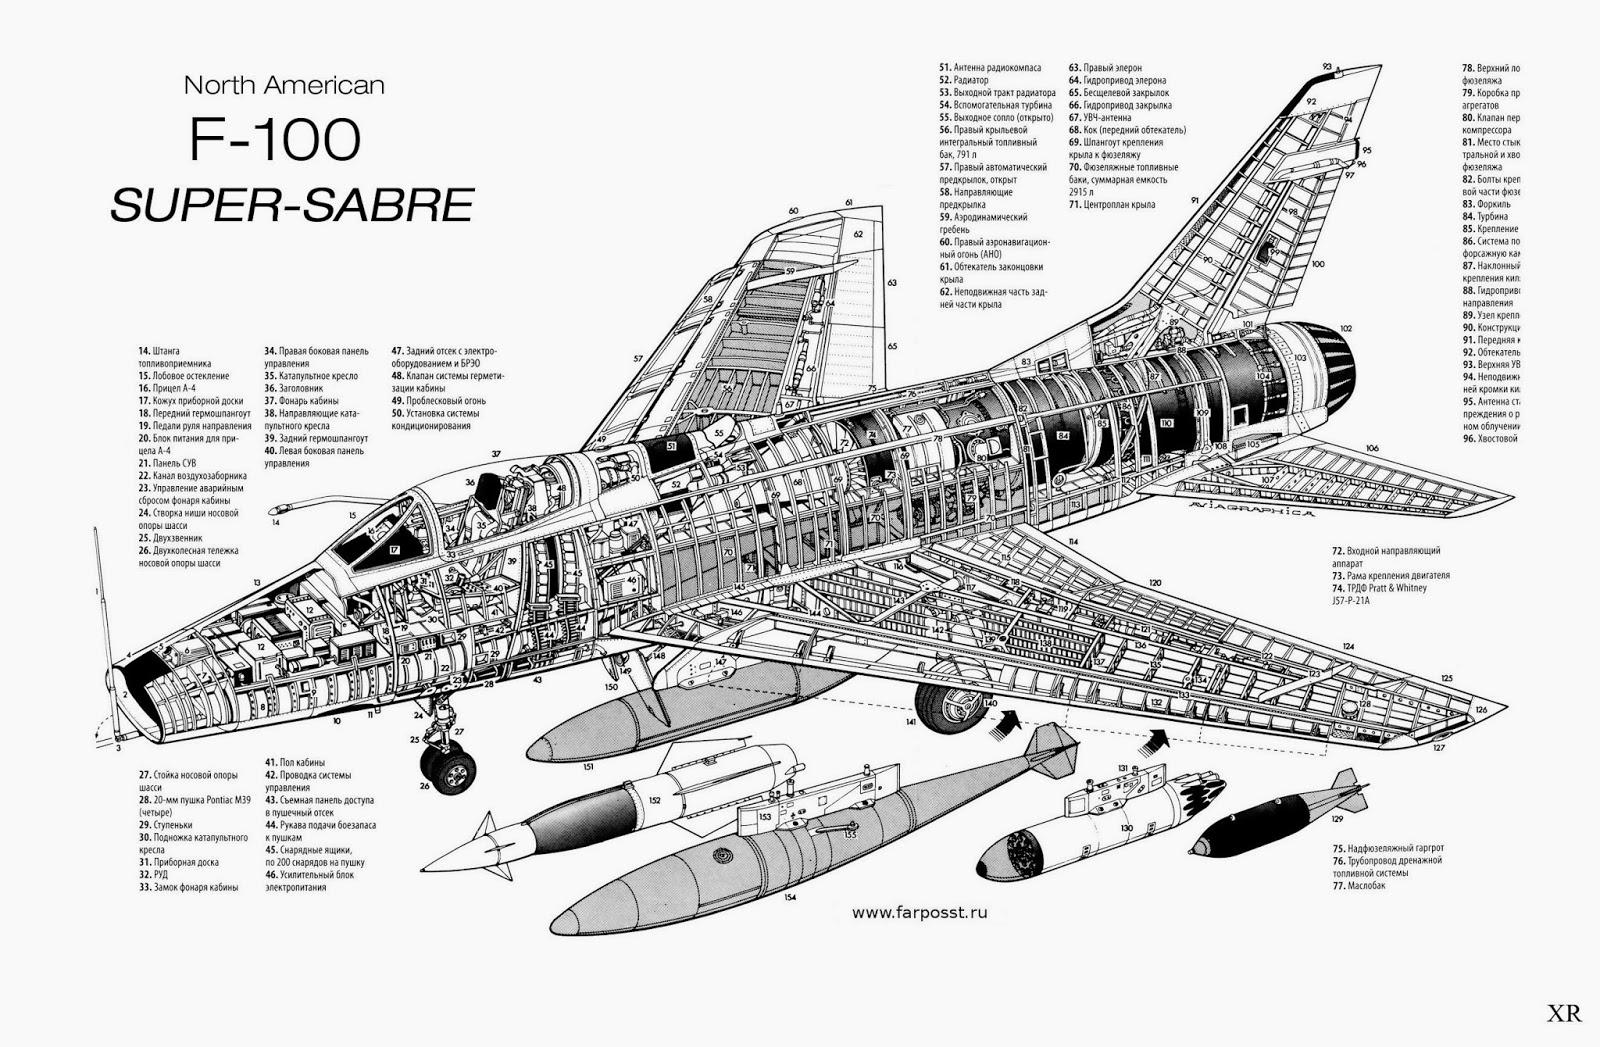 Atomic Annihilation North American Super Sabre